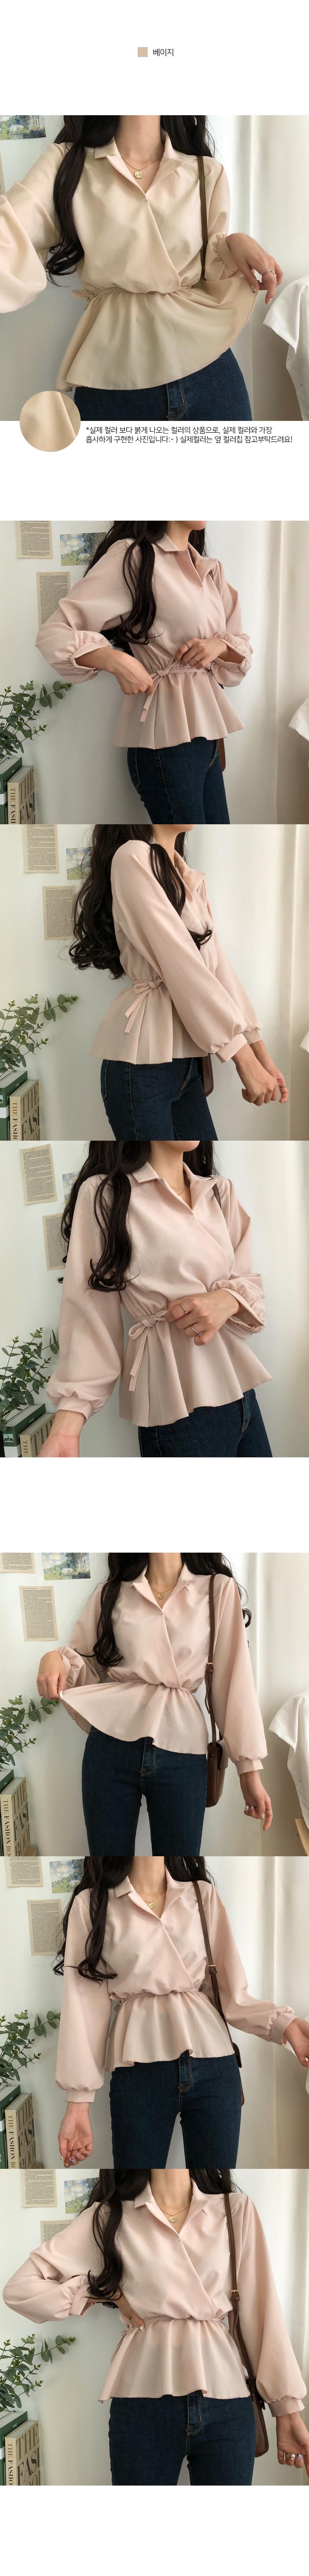 Benicara flared blouse